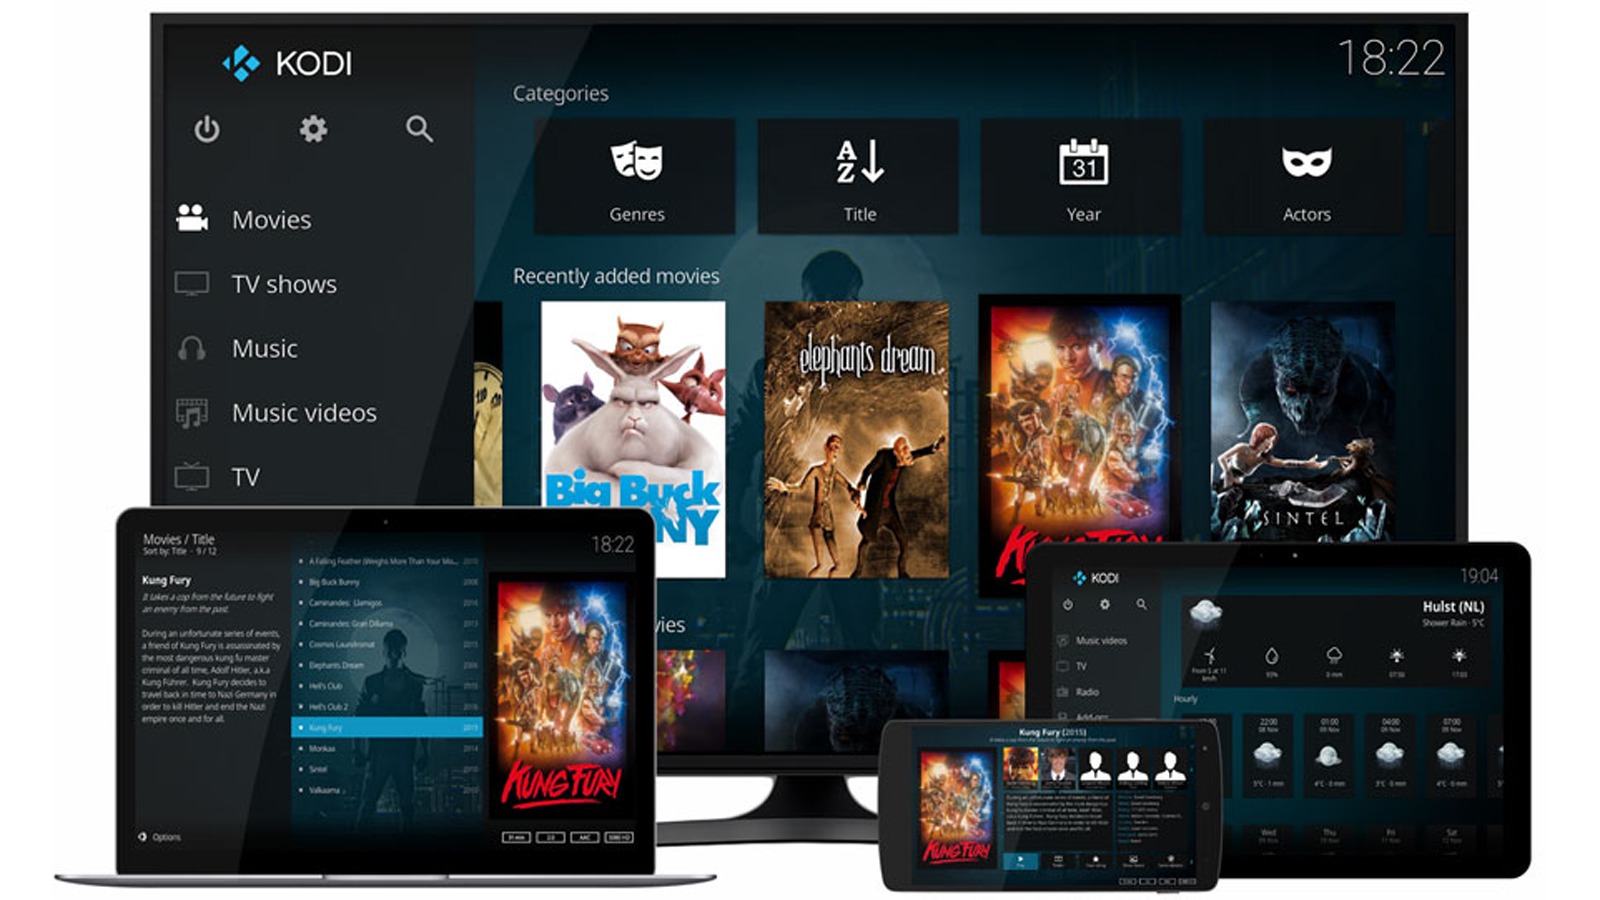 Kodi on TV, laptop, tablet, and smartphone